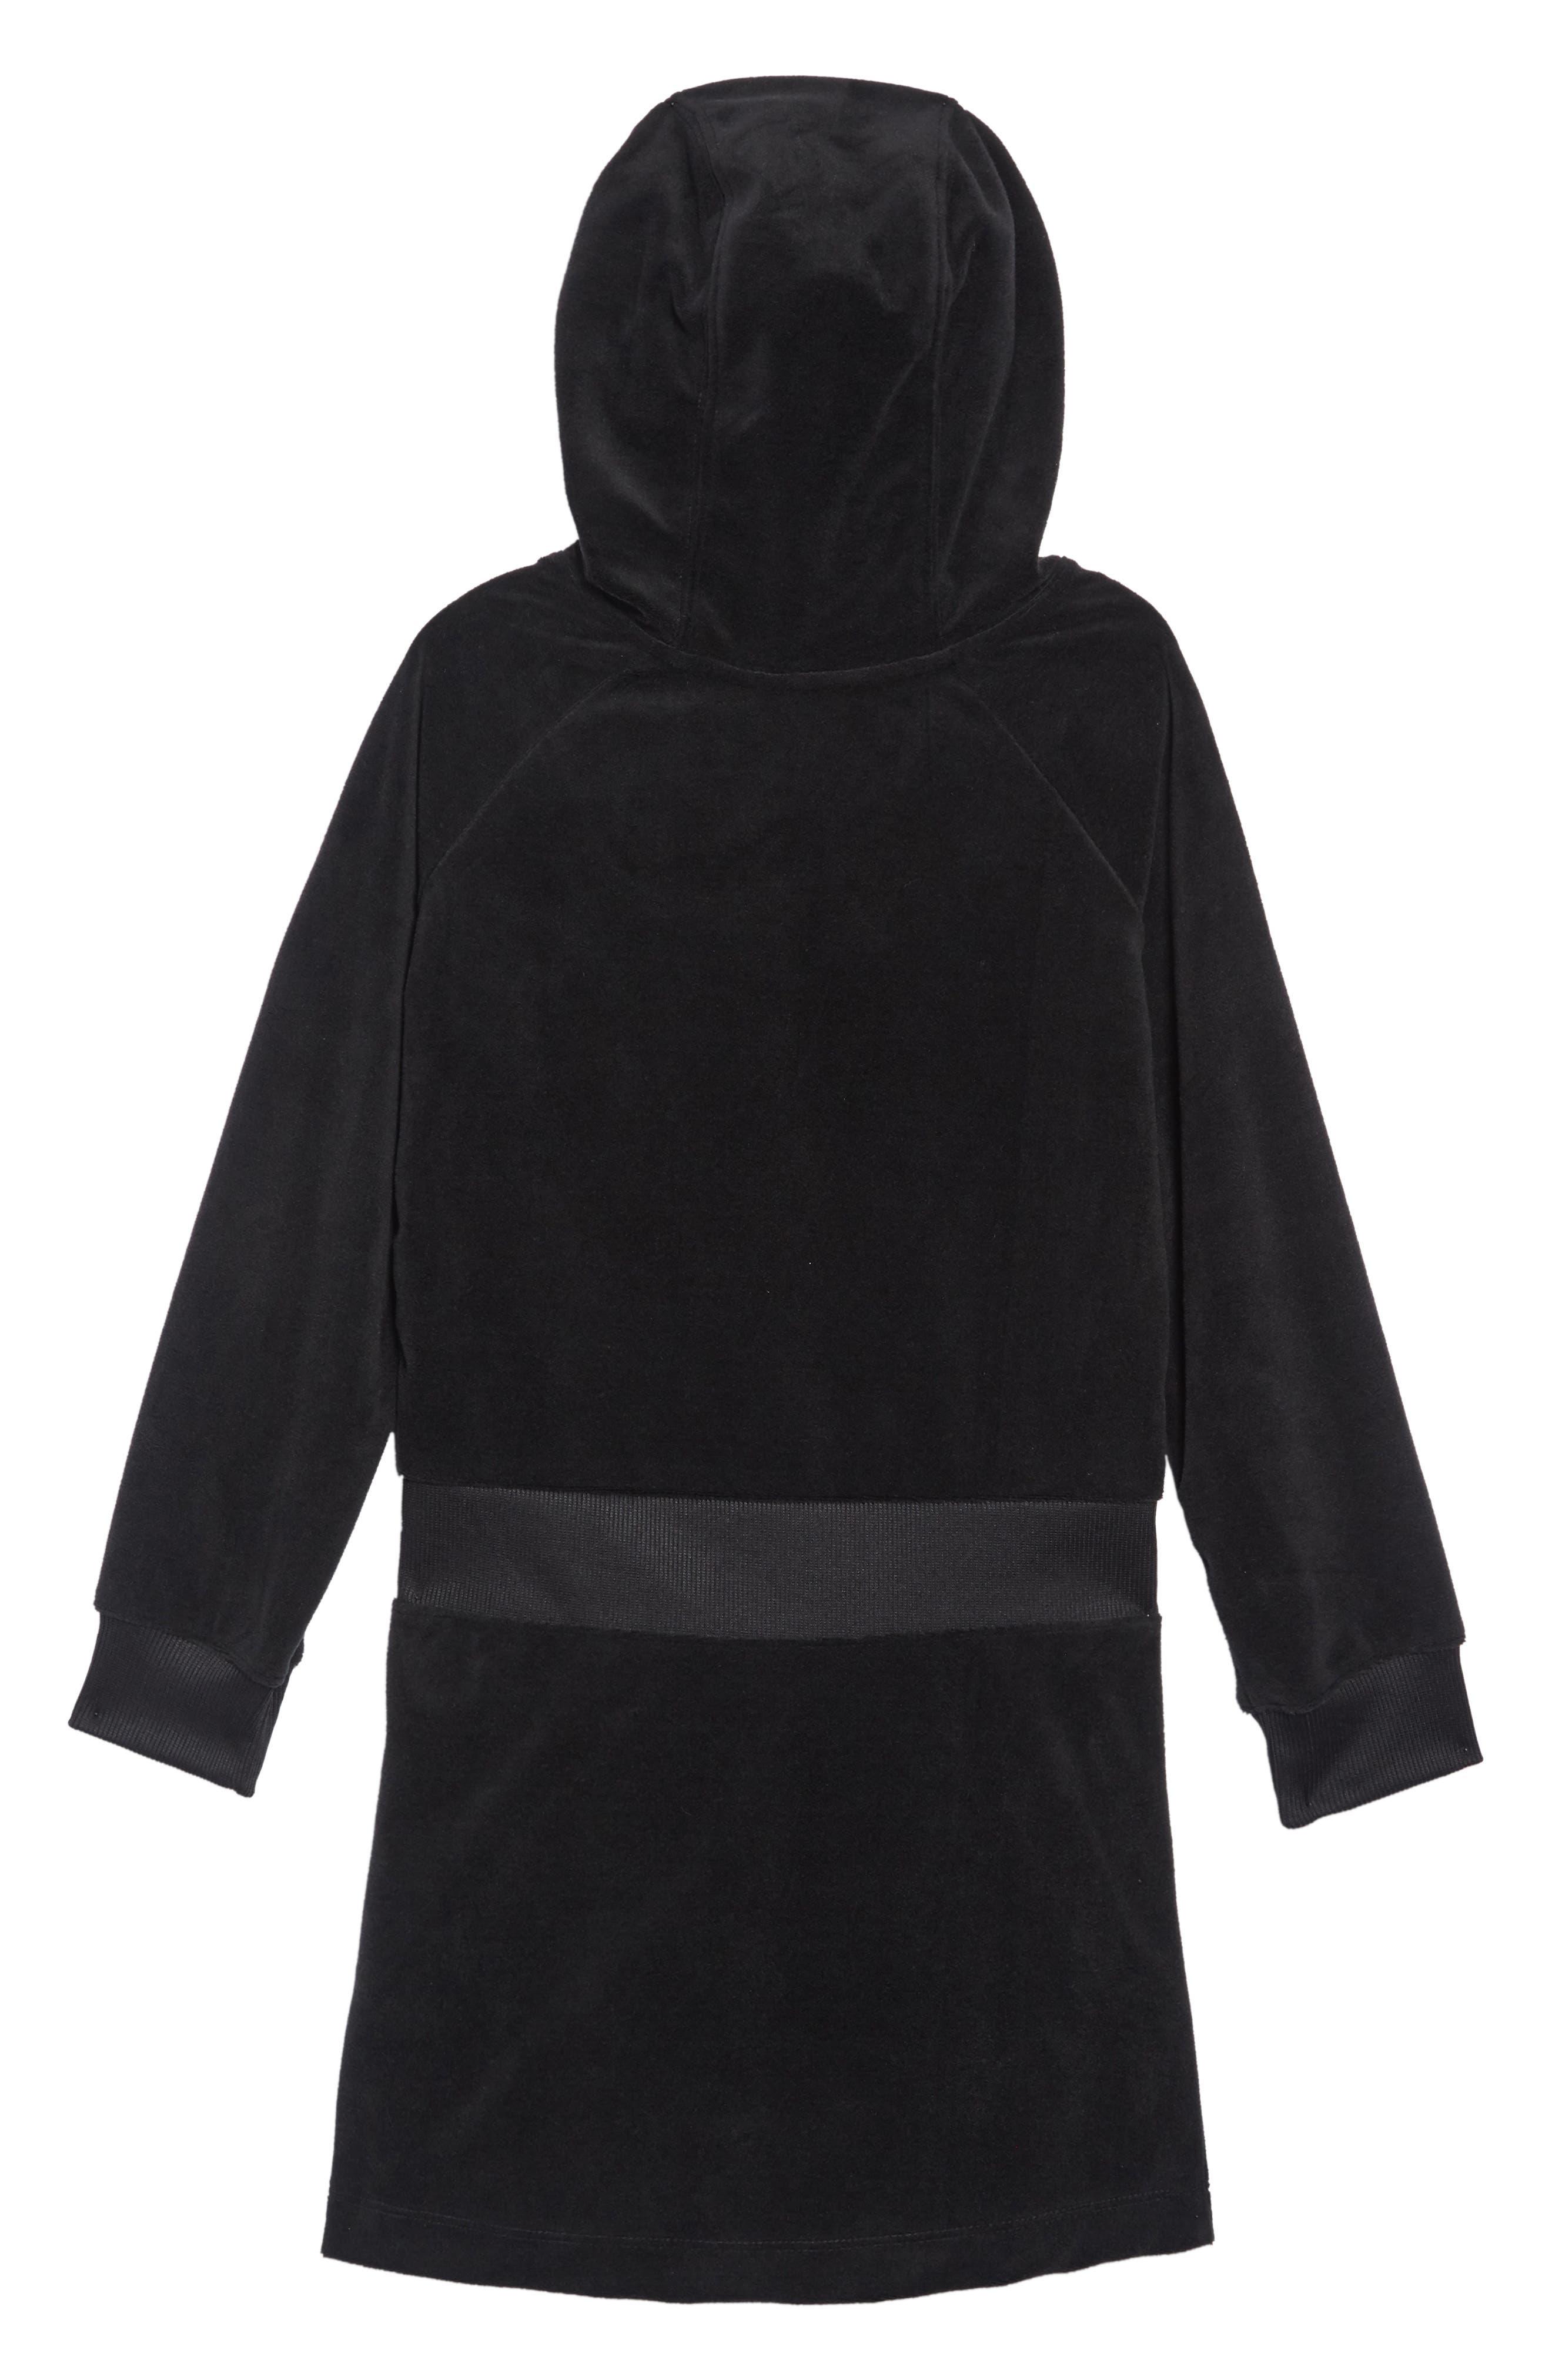 Velour Hooded Sweatshirt Dress,                             Alternate thumbnail 2, color,                             BLACK